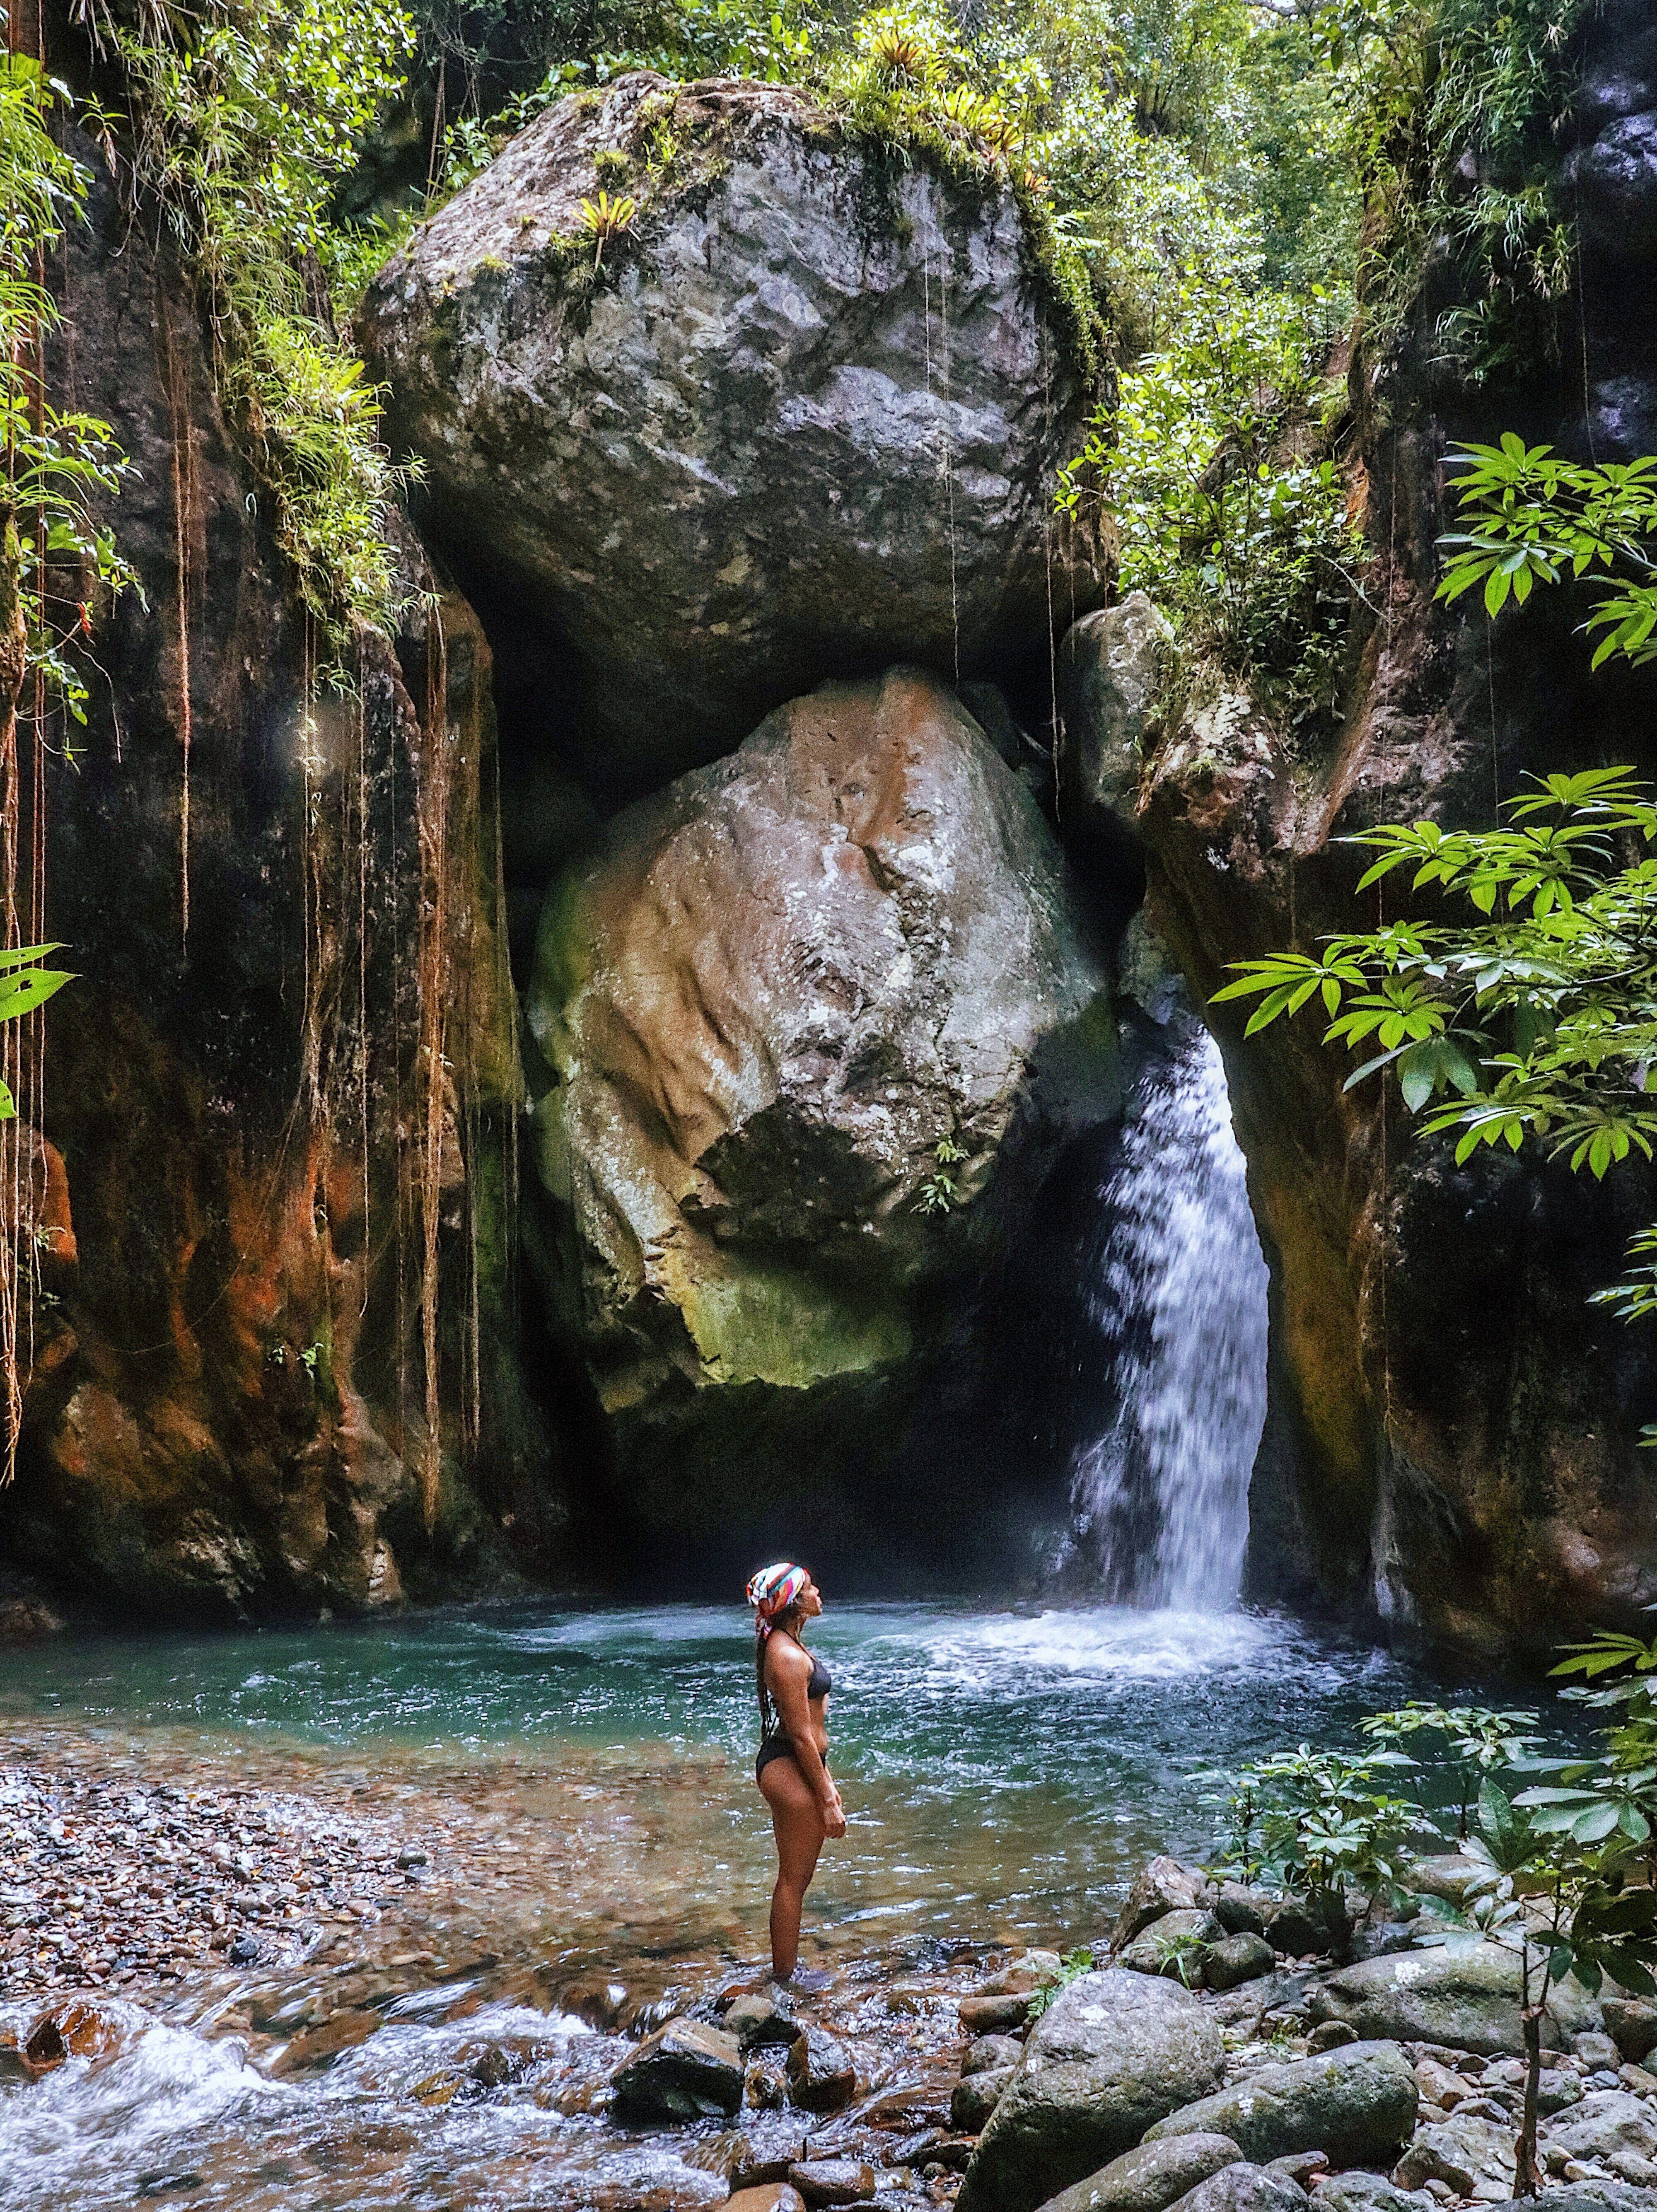 Solsea Travel Panama Para Aventureros Panama Travel Beautiful Places To Travel Panama City Panama